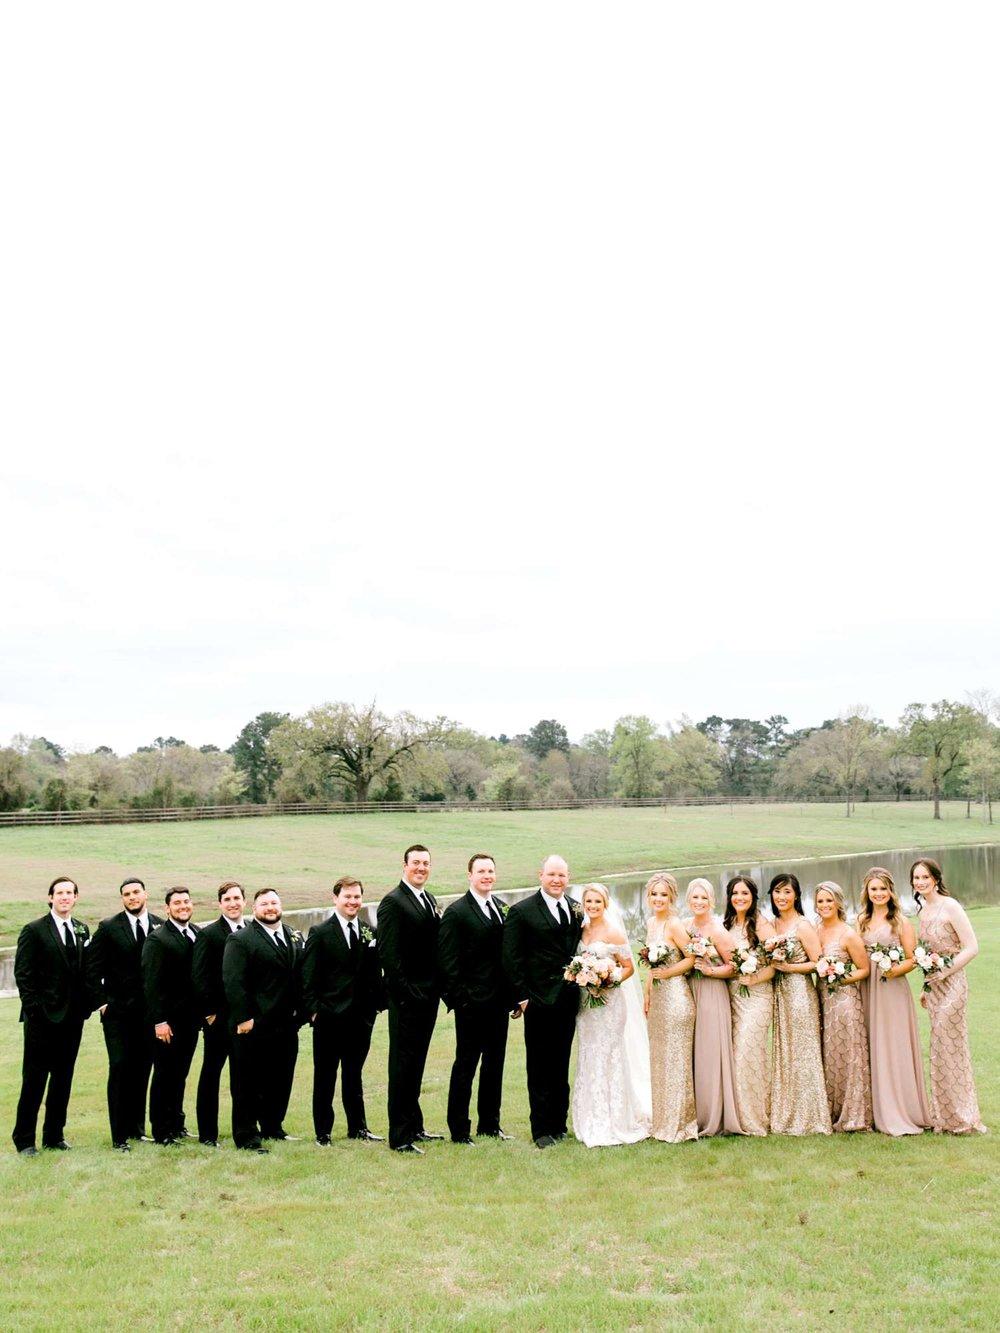 HEBERT_MORGAN_AND_CLAY_ALLEEJ_THE_FARMHOUSE_MONTGOMERY_TEXAS_WEDDING_0142.jpg